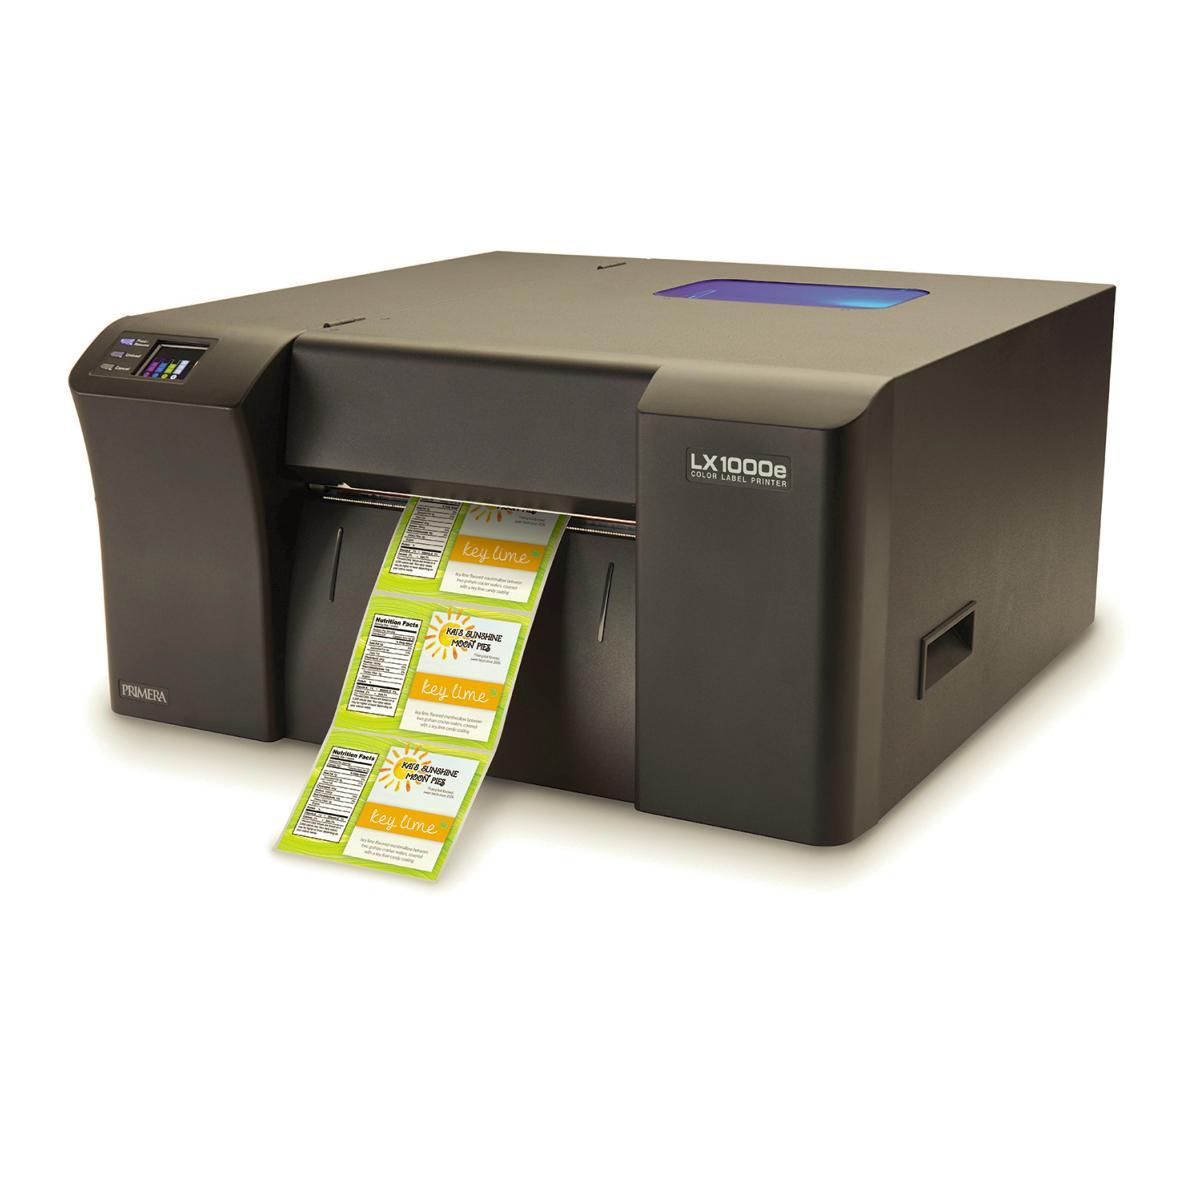 lx900 color label printer driver